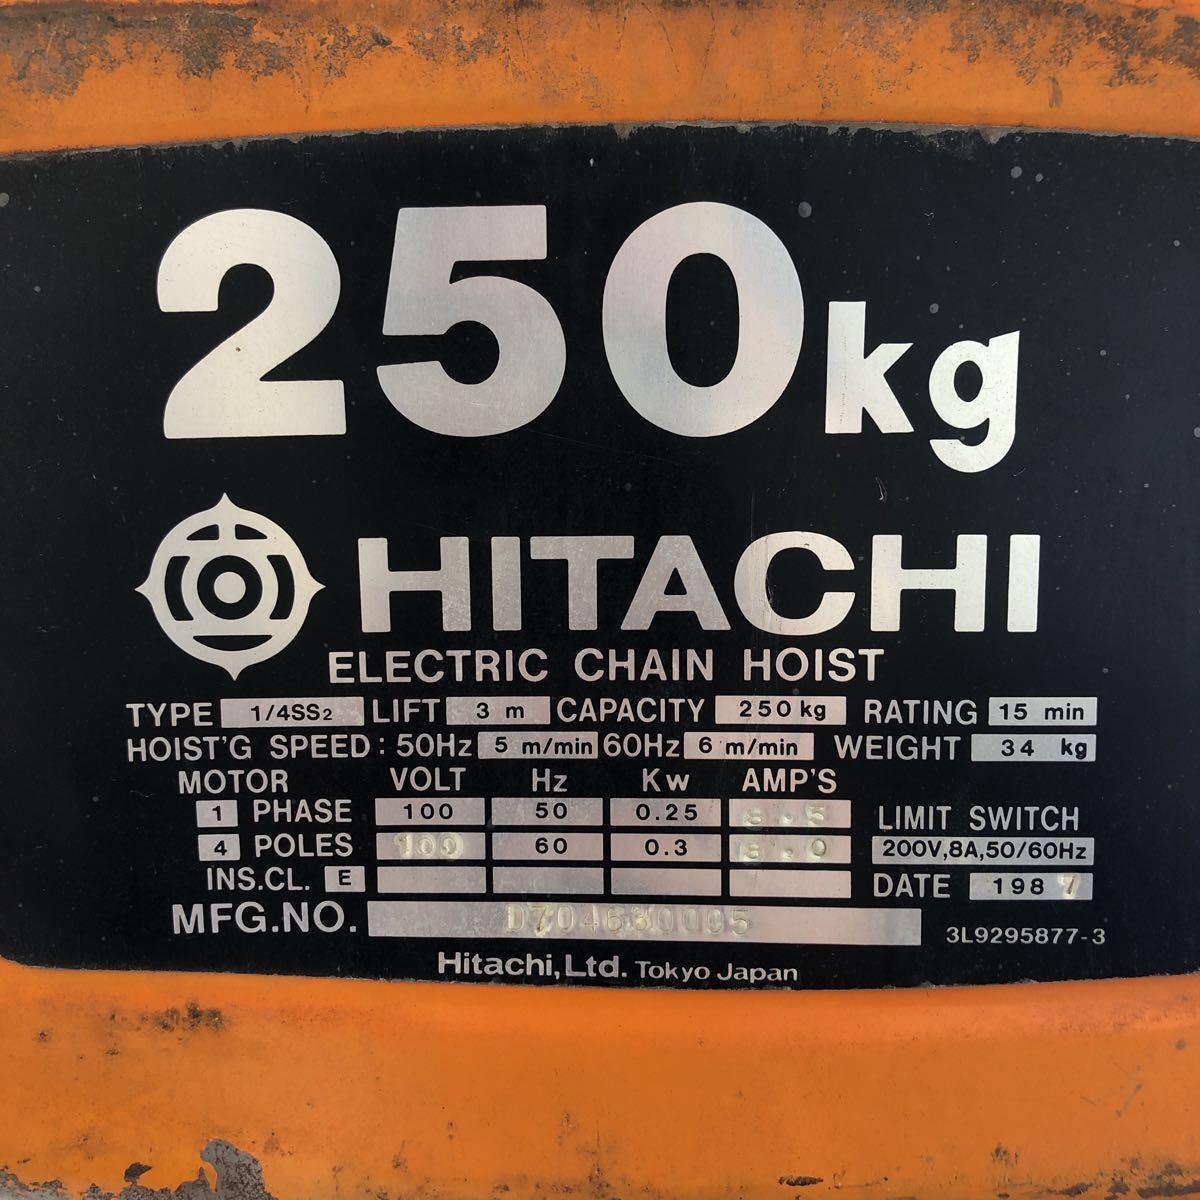 HITACHI 電動チェーンブロック ホイスト 1/4SS2 250kg 動作確認済み 八王子市より出品 引取りも歓迎 1円スタート_画像10